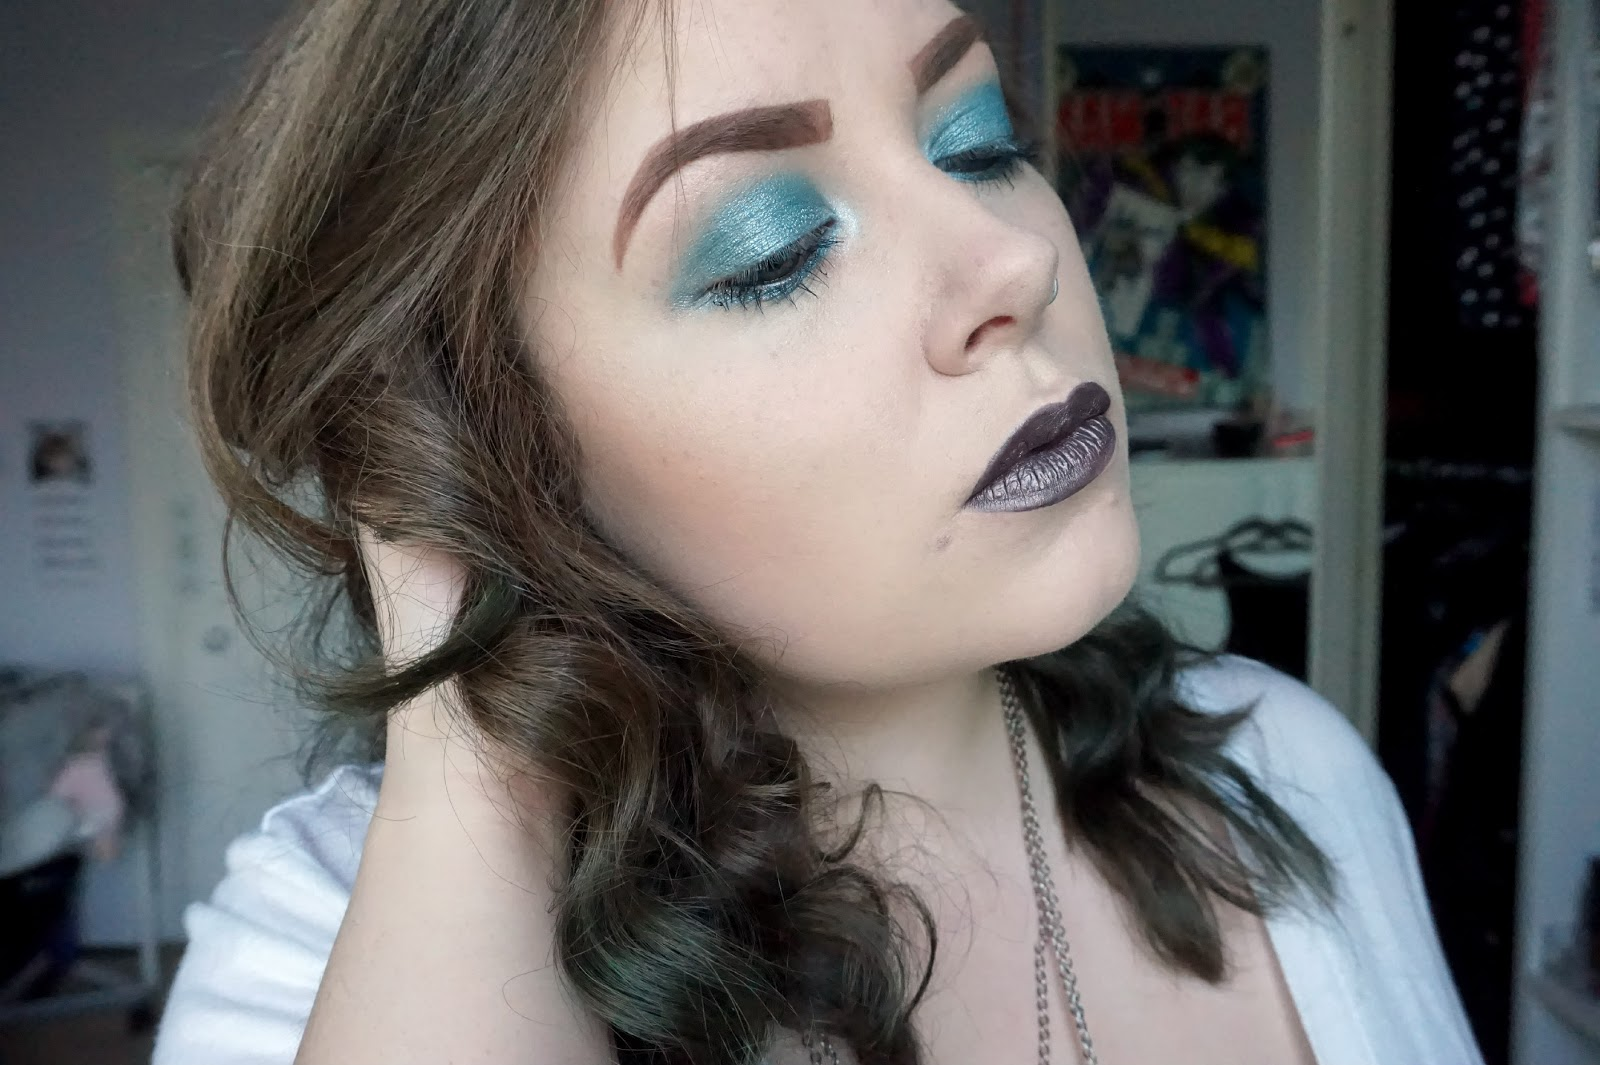 mermaid make-up look, h&m water sprite eyeshadow, jeffree star restraint liquid lipstick